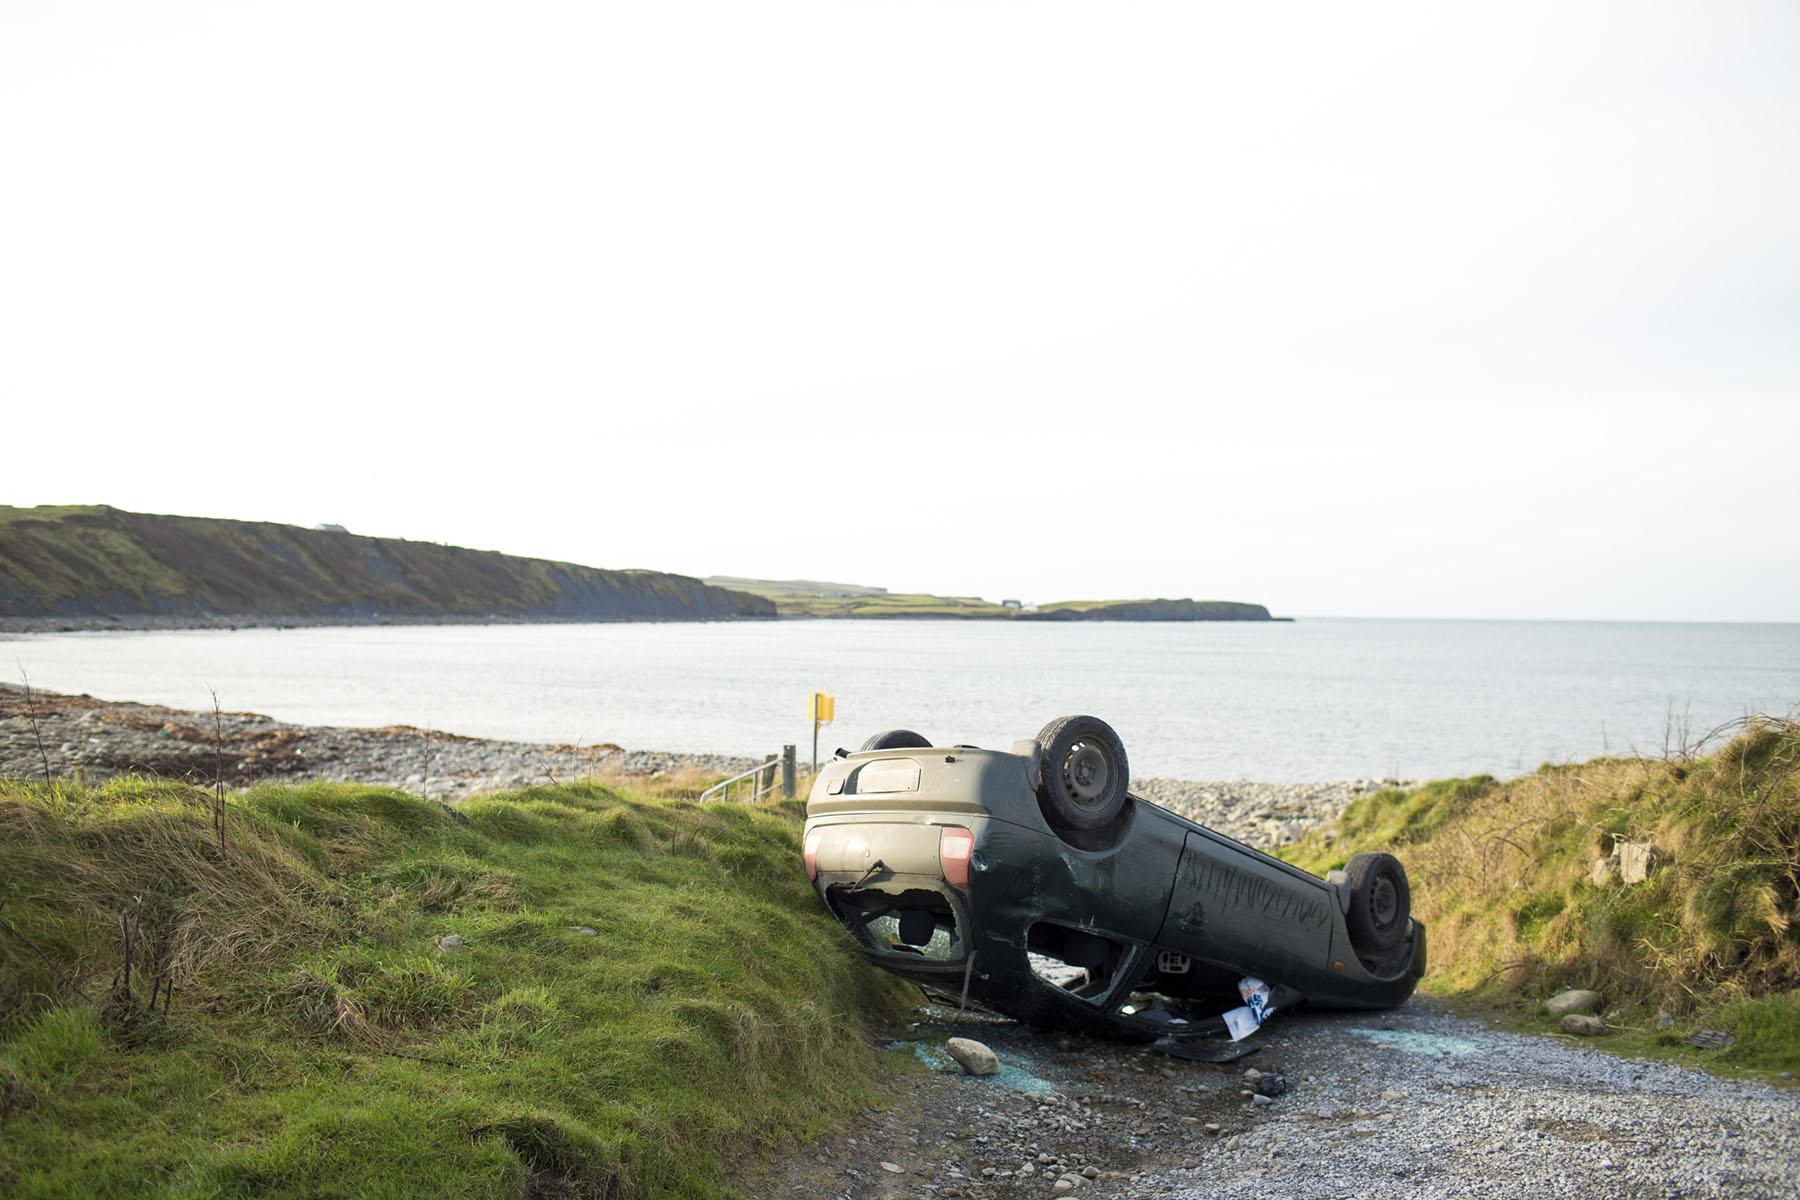 Road Traffic Accident (RTA) Investigation | Flipped car | Crash Detectives Ltd